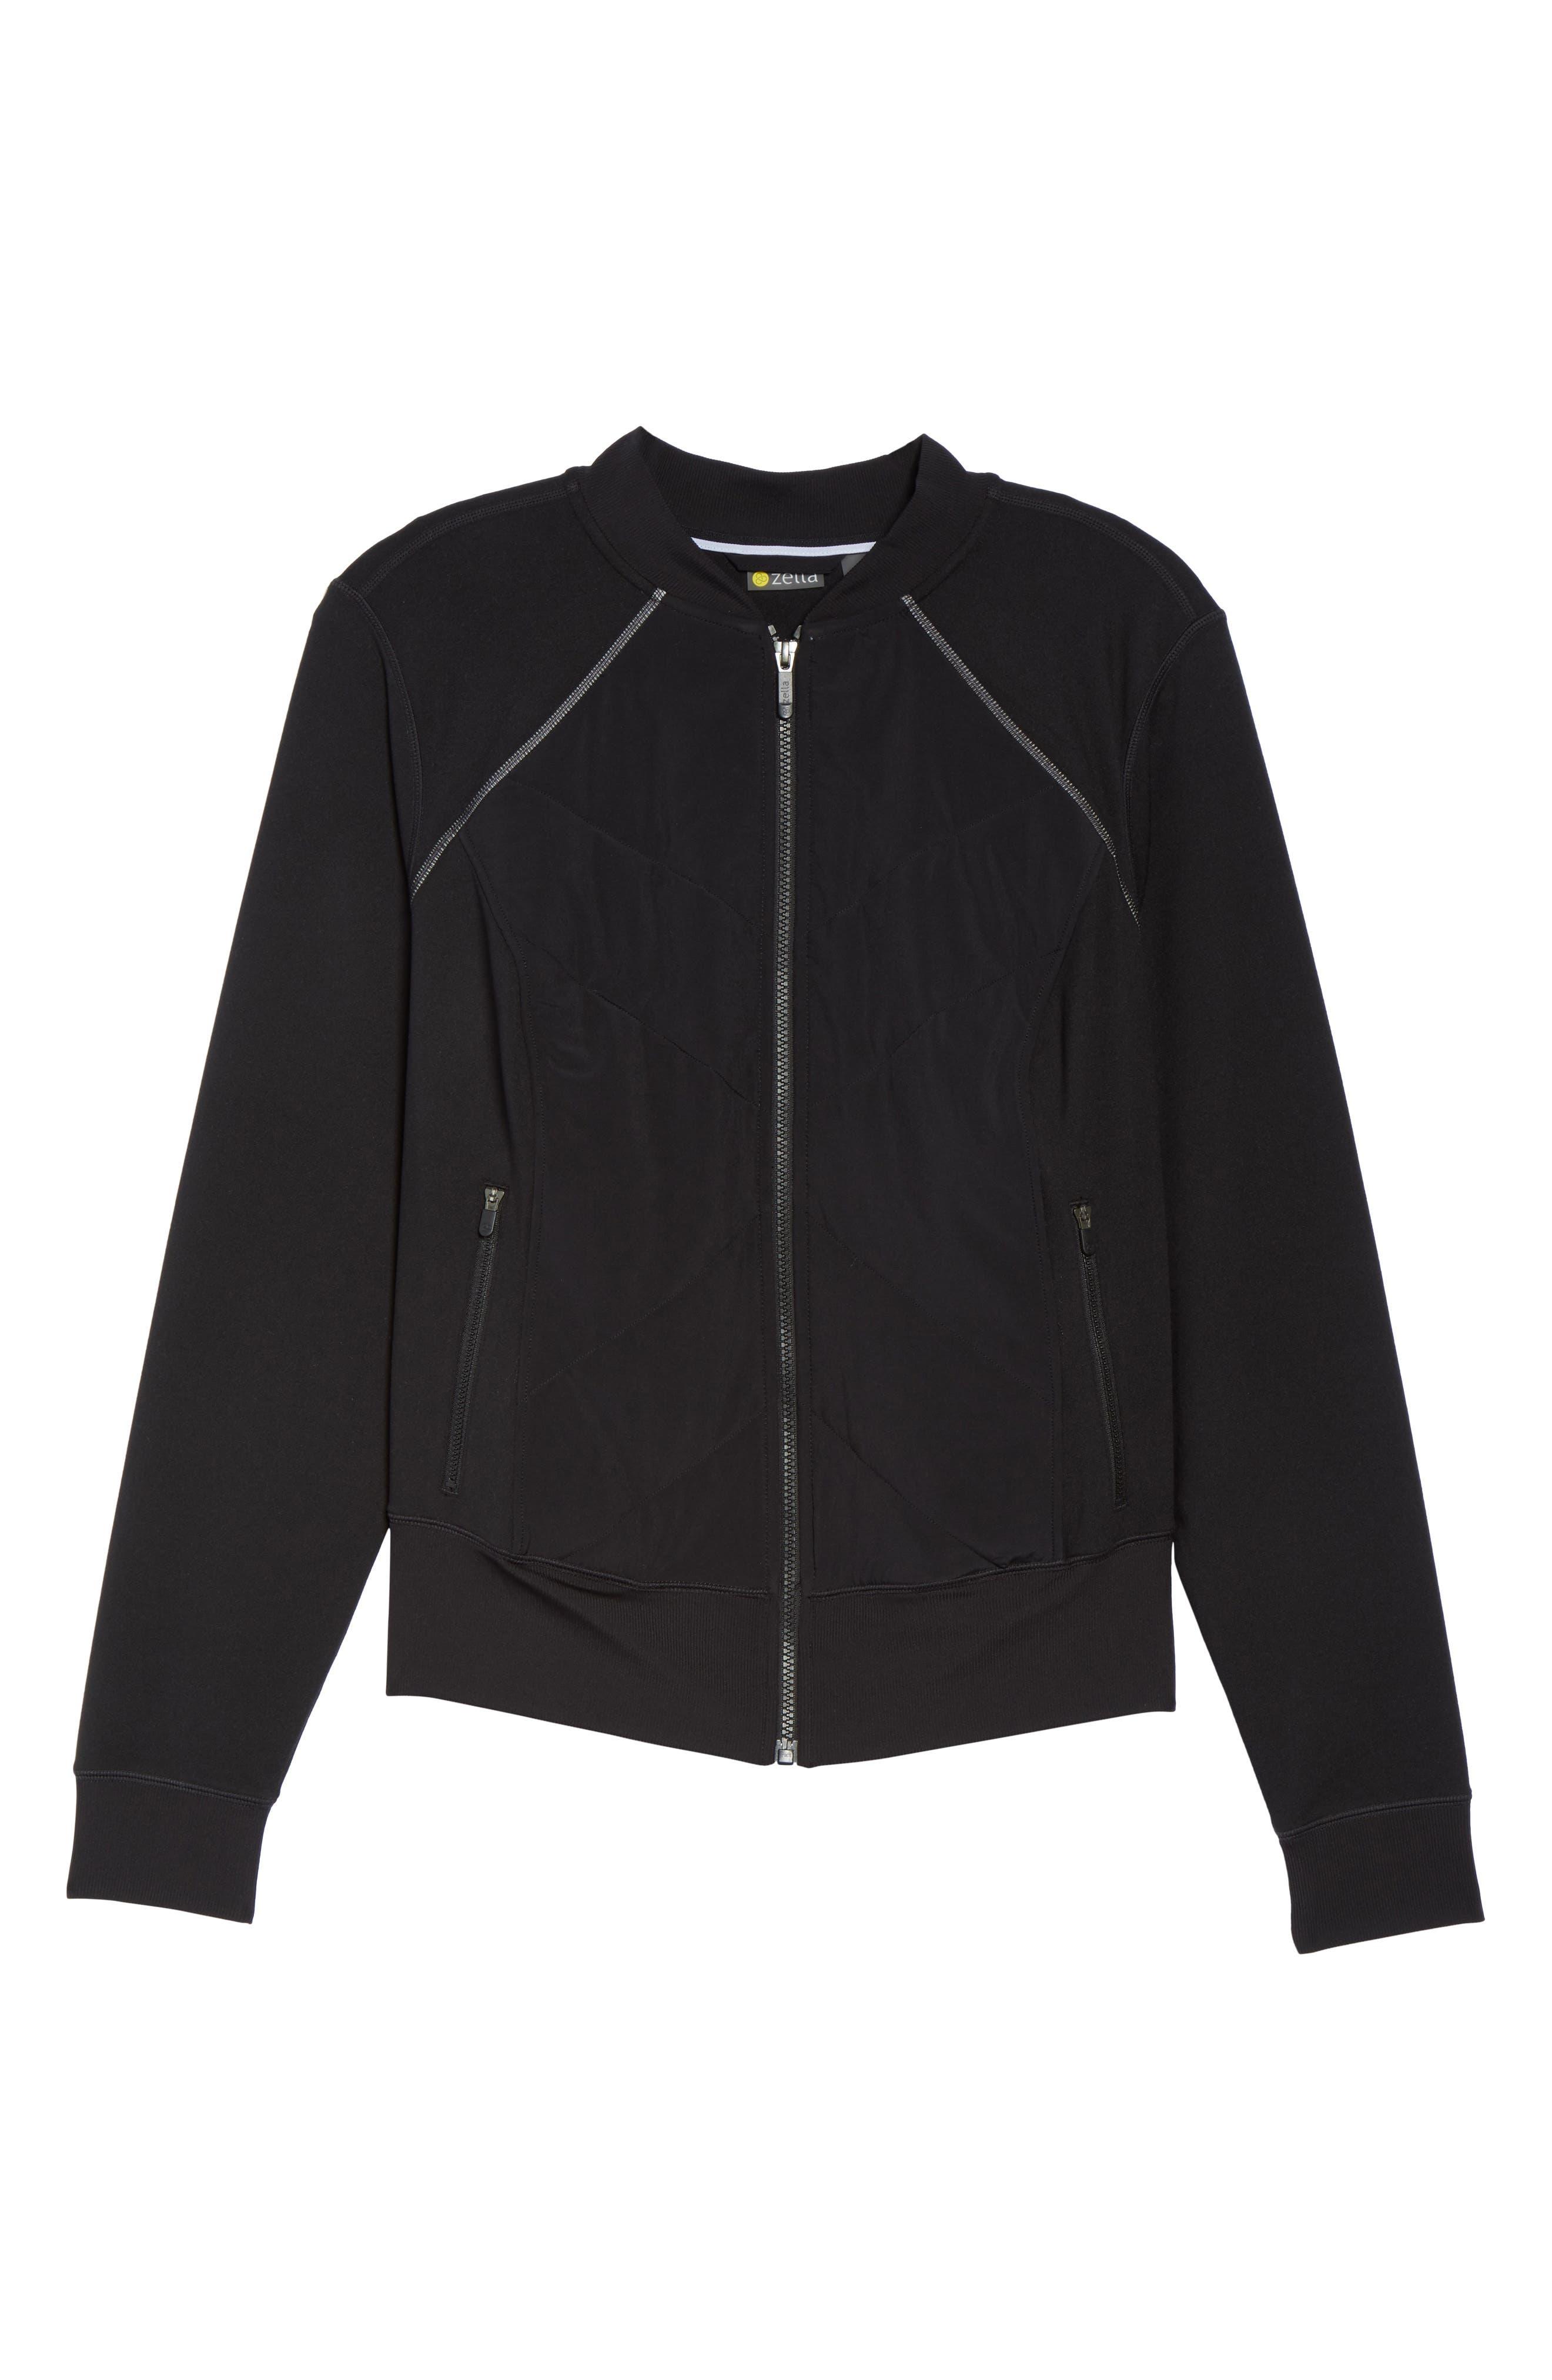 Wear It Out Bomber Jacket,                             Alternate thumbnail 6, color,                             Black